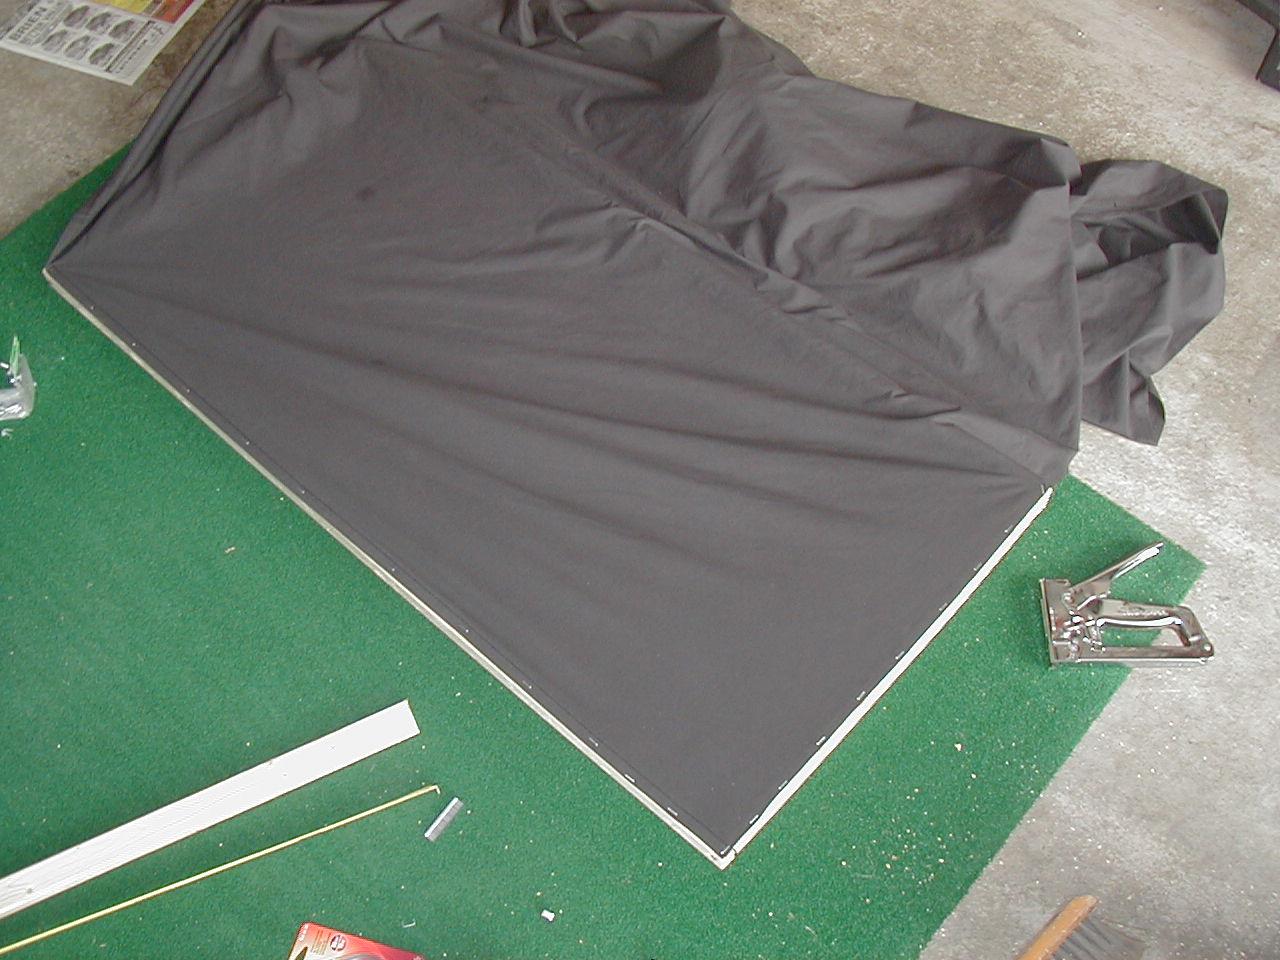 One More Diy Acoustic Panels Thread Gearslutz Pro